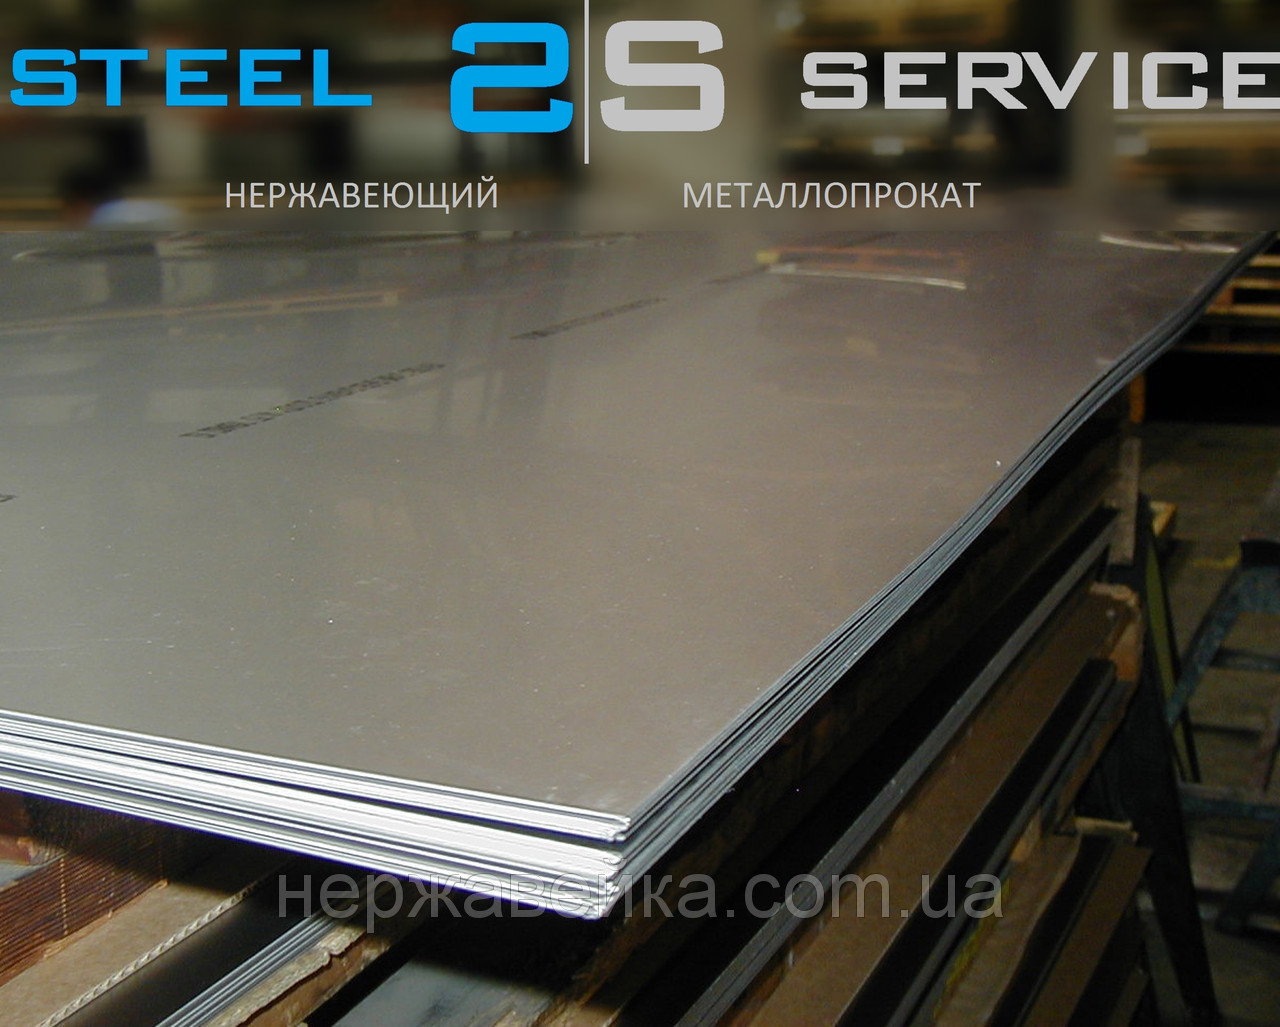 Нержавеющий лист 0,8х1500х3000мм  AISI 316L(03Х17Н14М3) 2B - матовый,  кислотостойкий